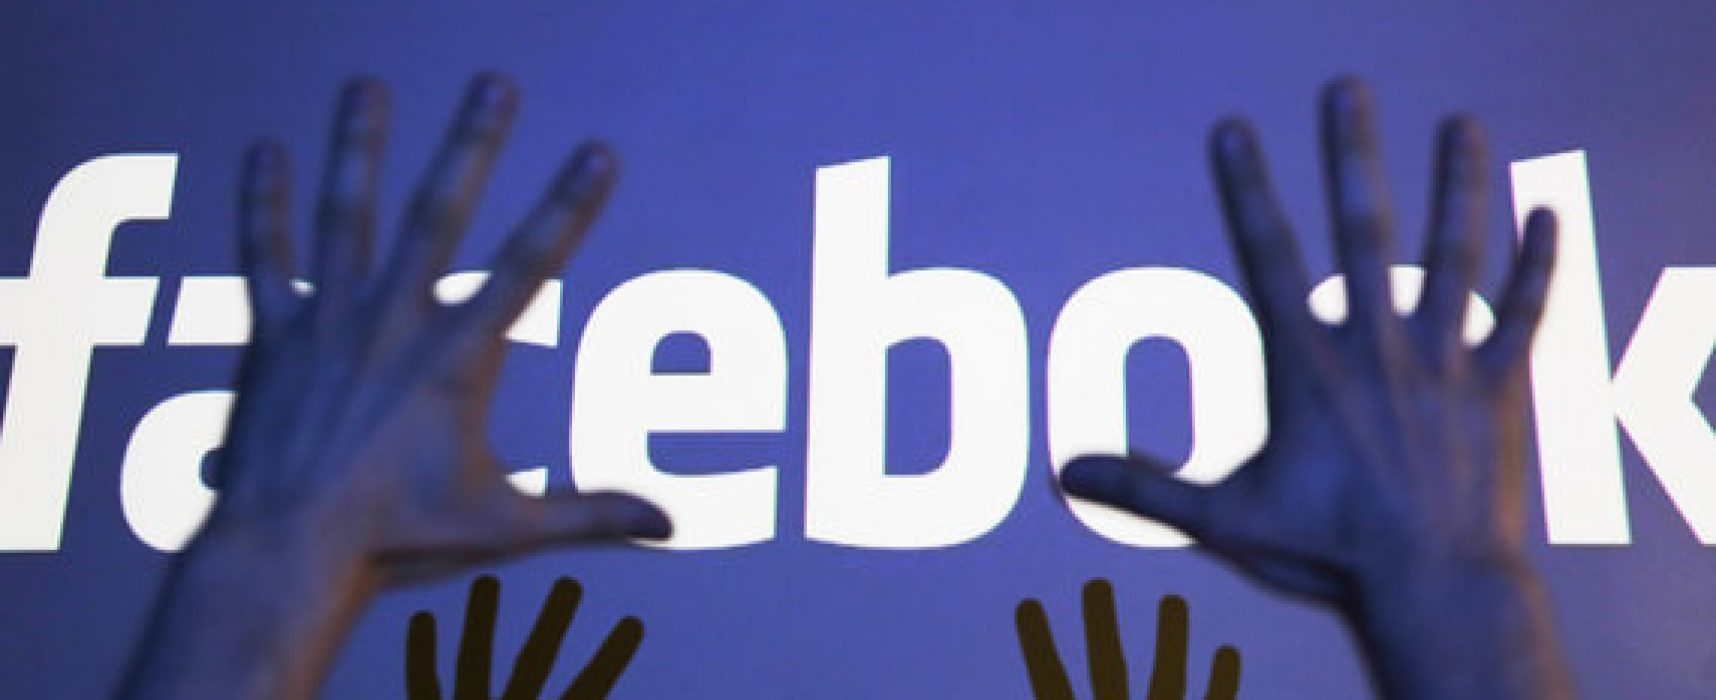 Facebook y Twitter eliminaron miles de cuentas falsas vinculadas a Rusia, Venezuela e Irán